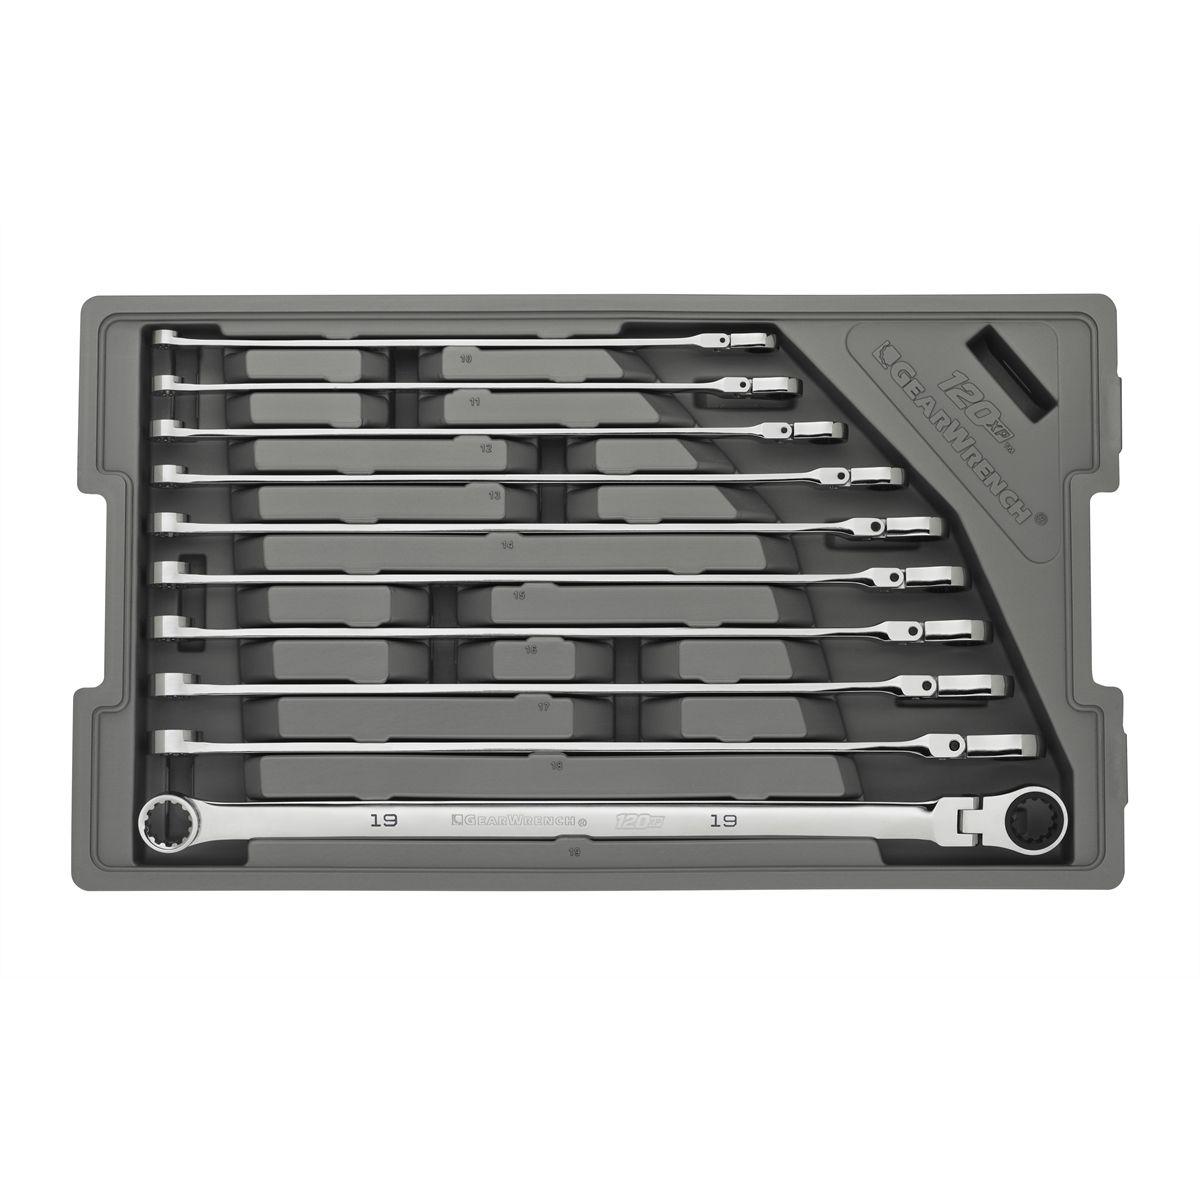 GearWrench 120XP 12 Pc Universal Spline Metric XL Combination Ratcheting 86229